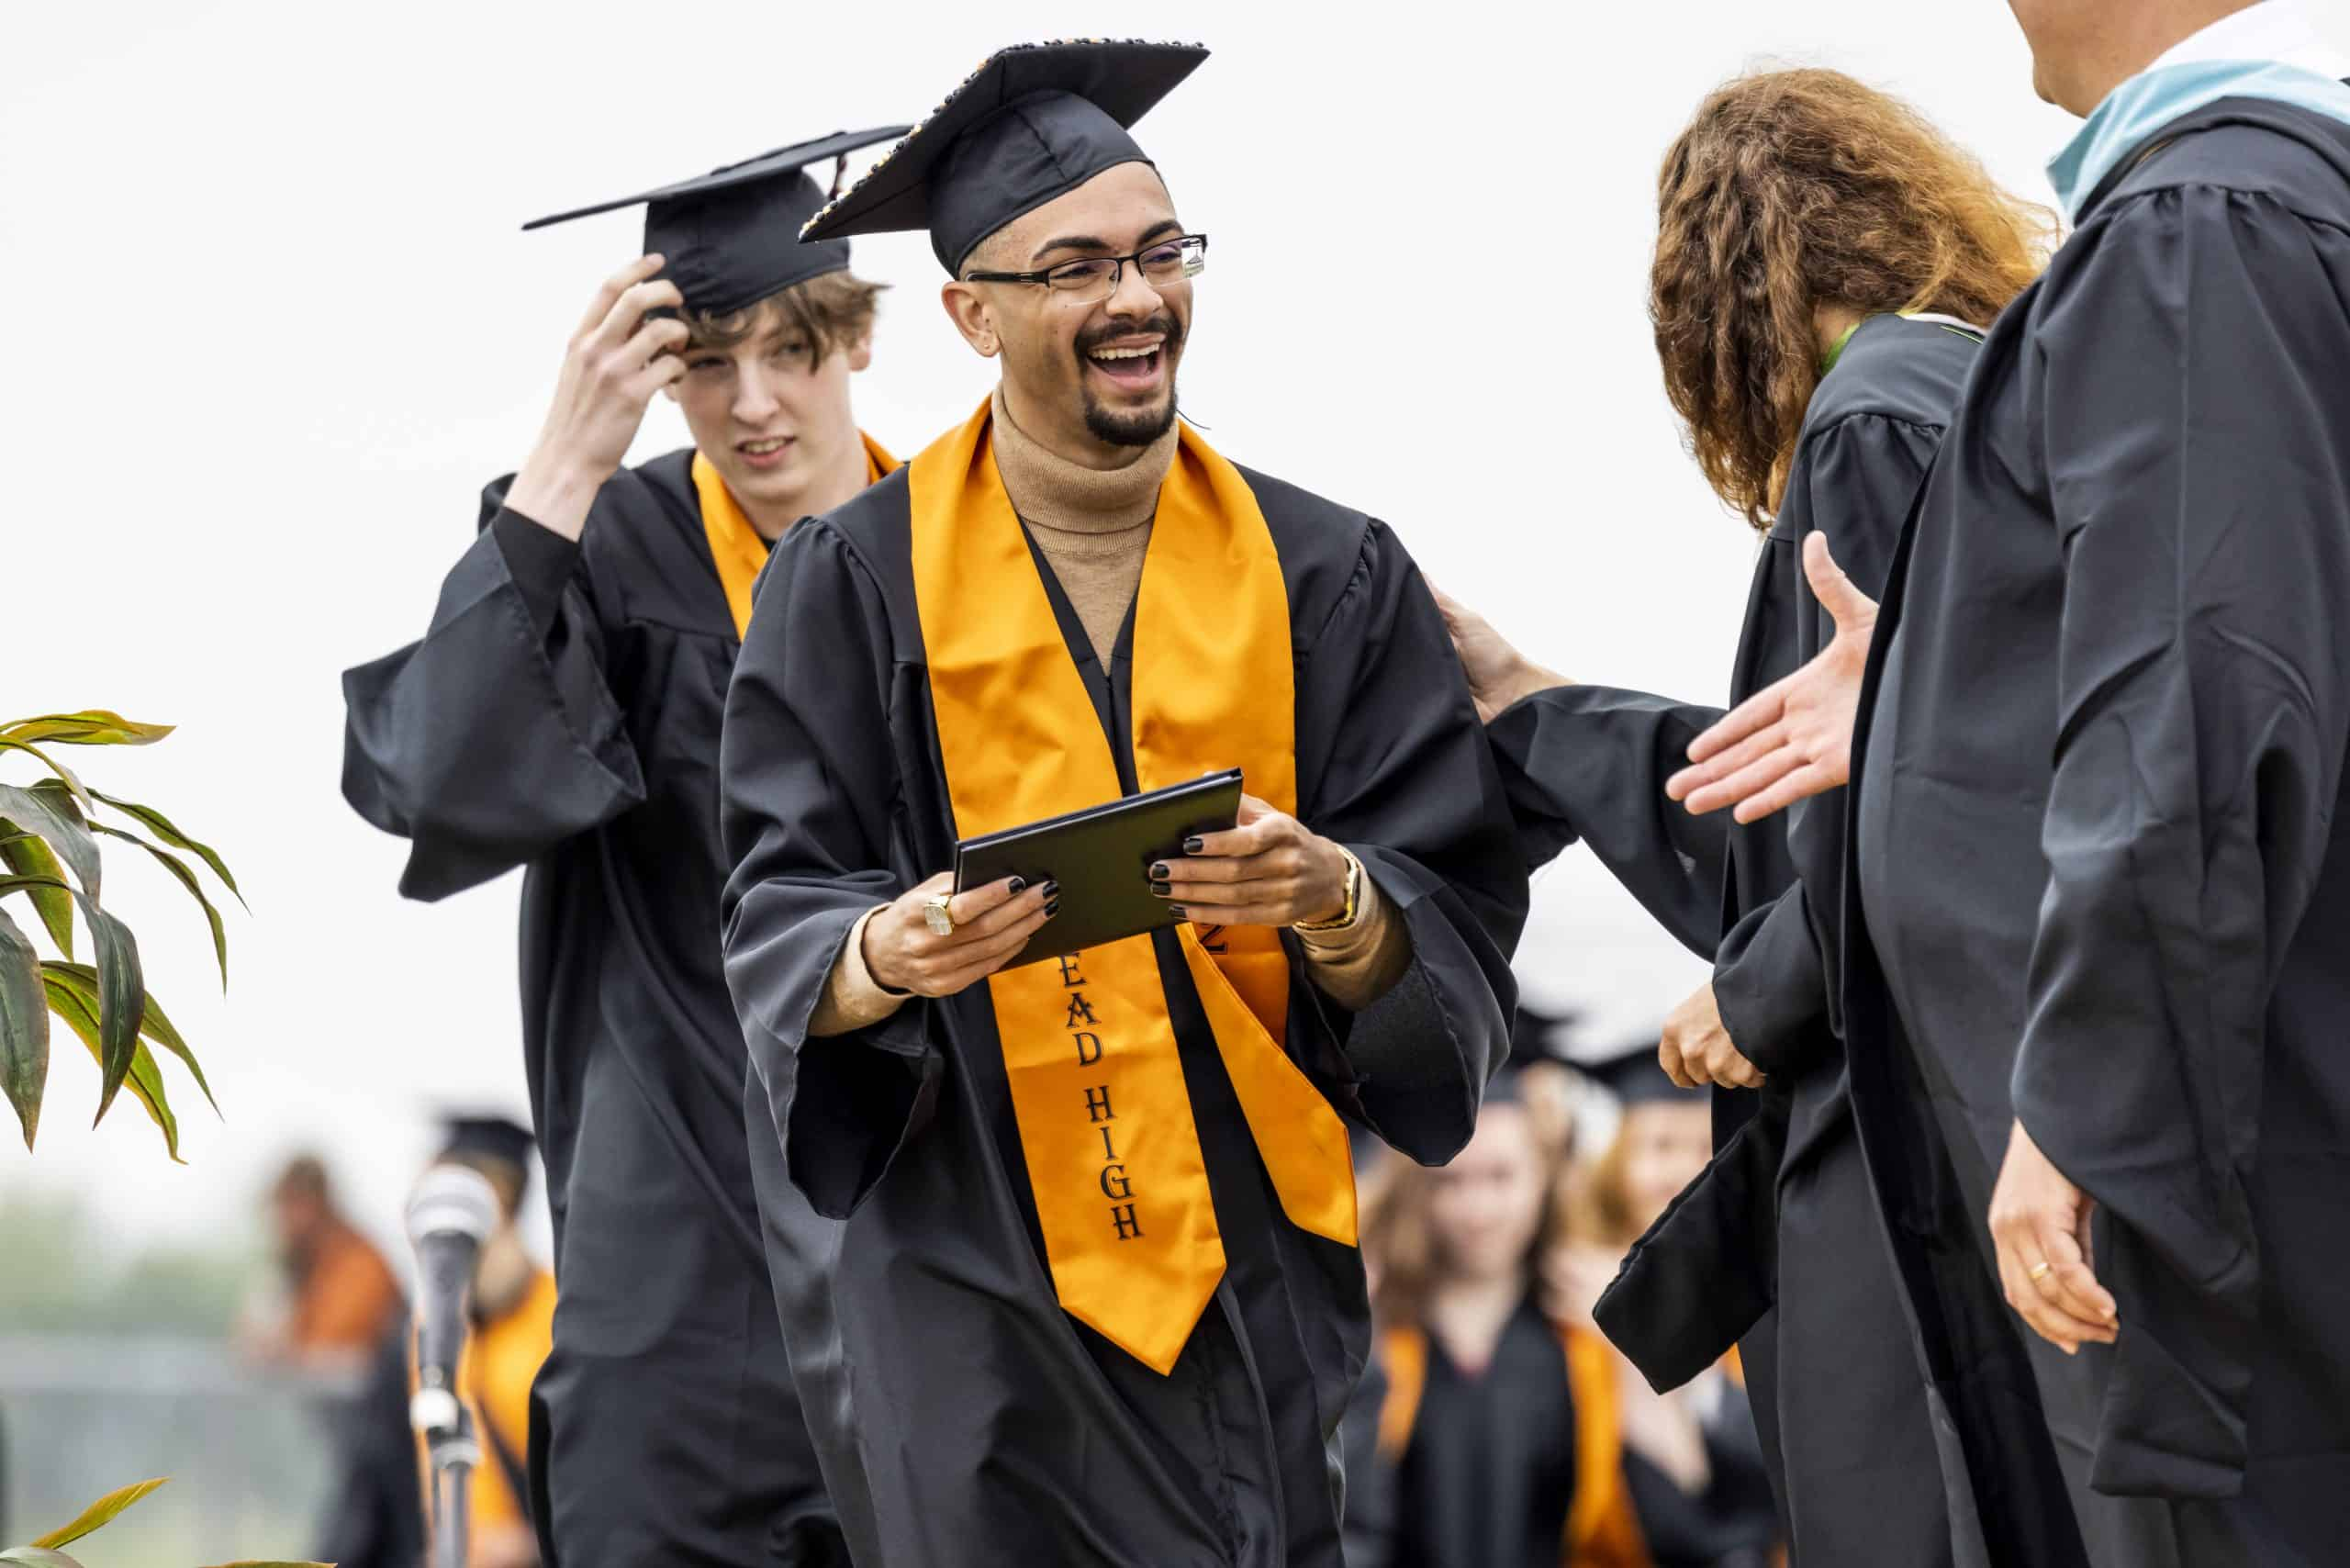 Male graduate receiving his diploma